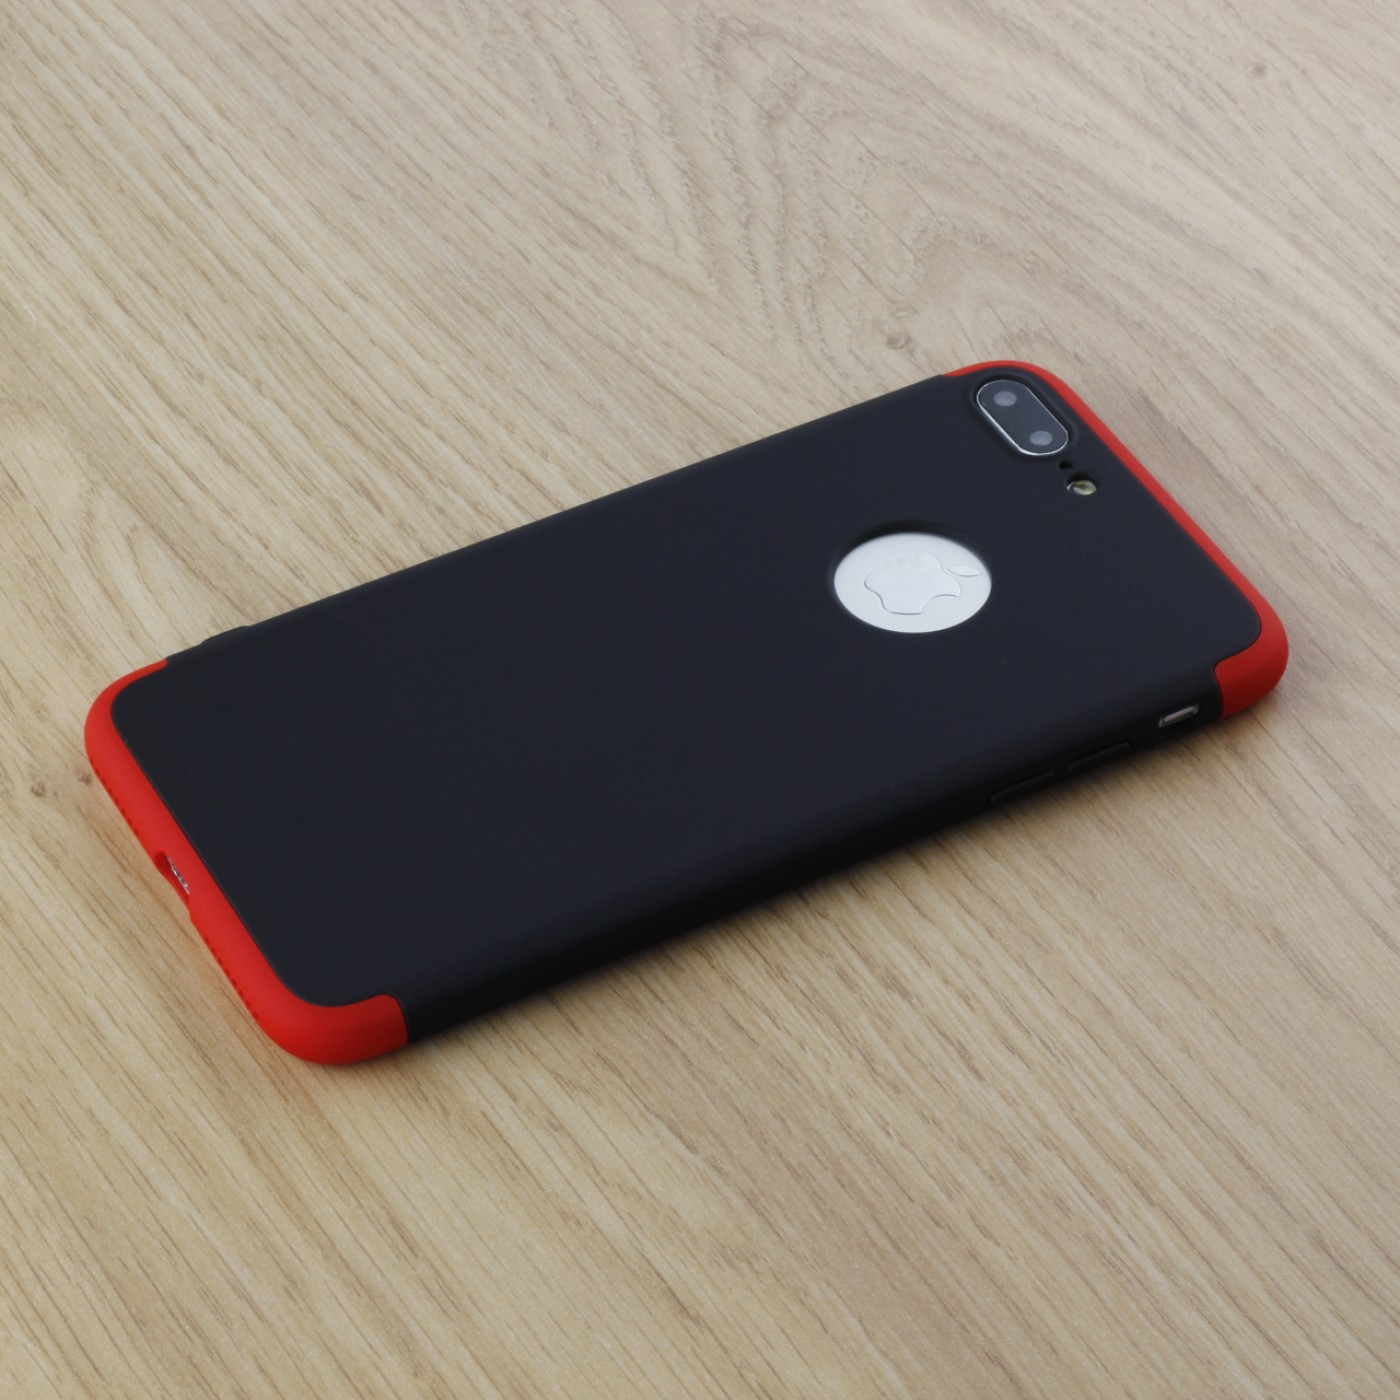 coque iphone 6 plus 6s plus 360 full body noir rouge. Black Bedroom Furniture Sets. Home Design Ideas